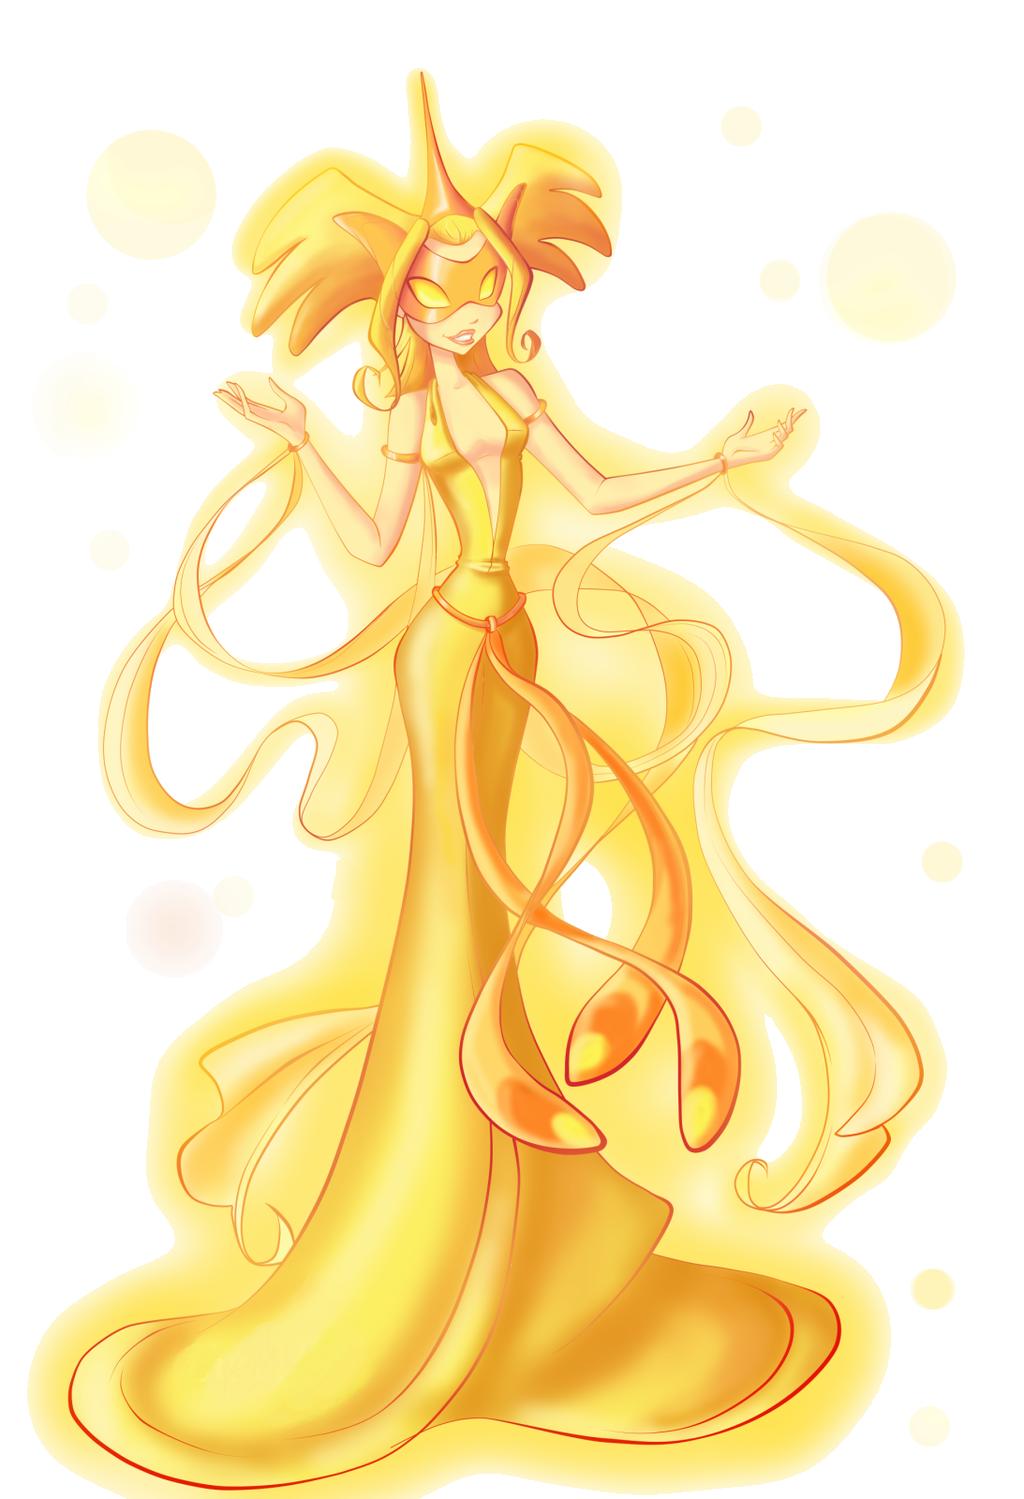 winx club daphne crown princess daphne is the elder daughter of